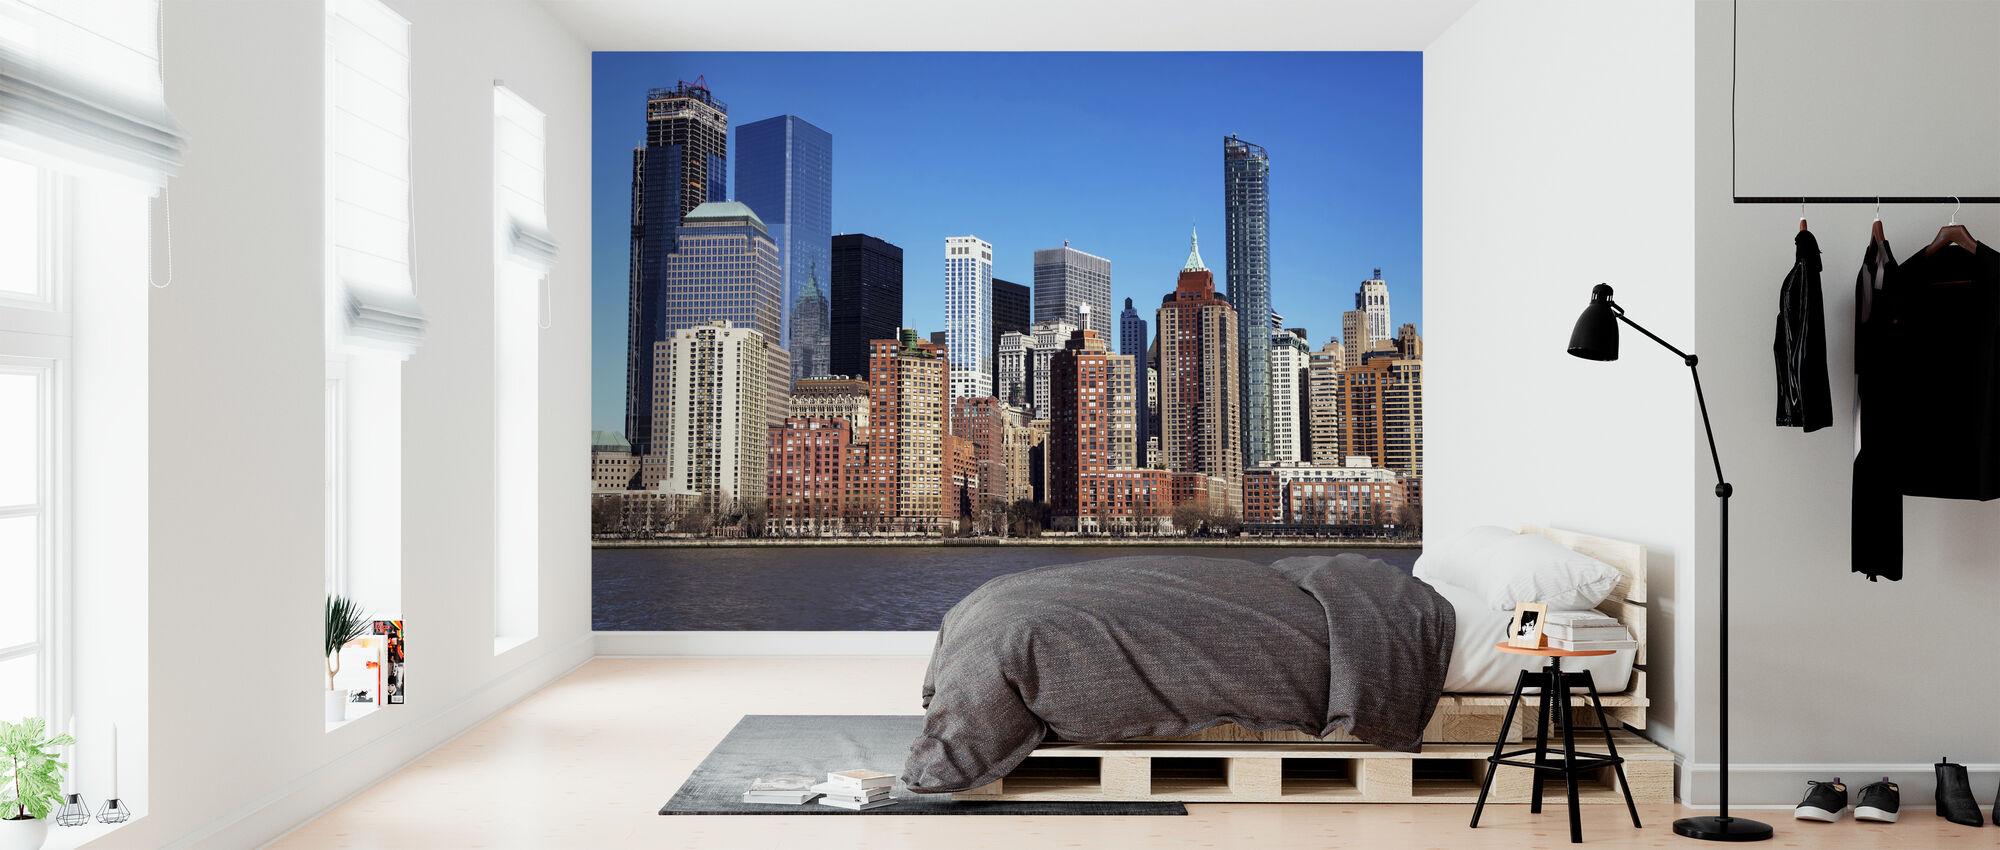 Manhattan Skyscraper - Wallpaper - Bedroom